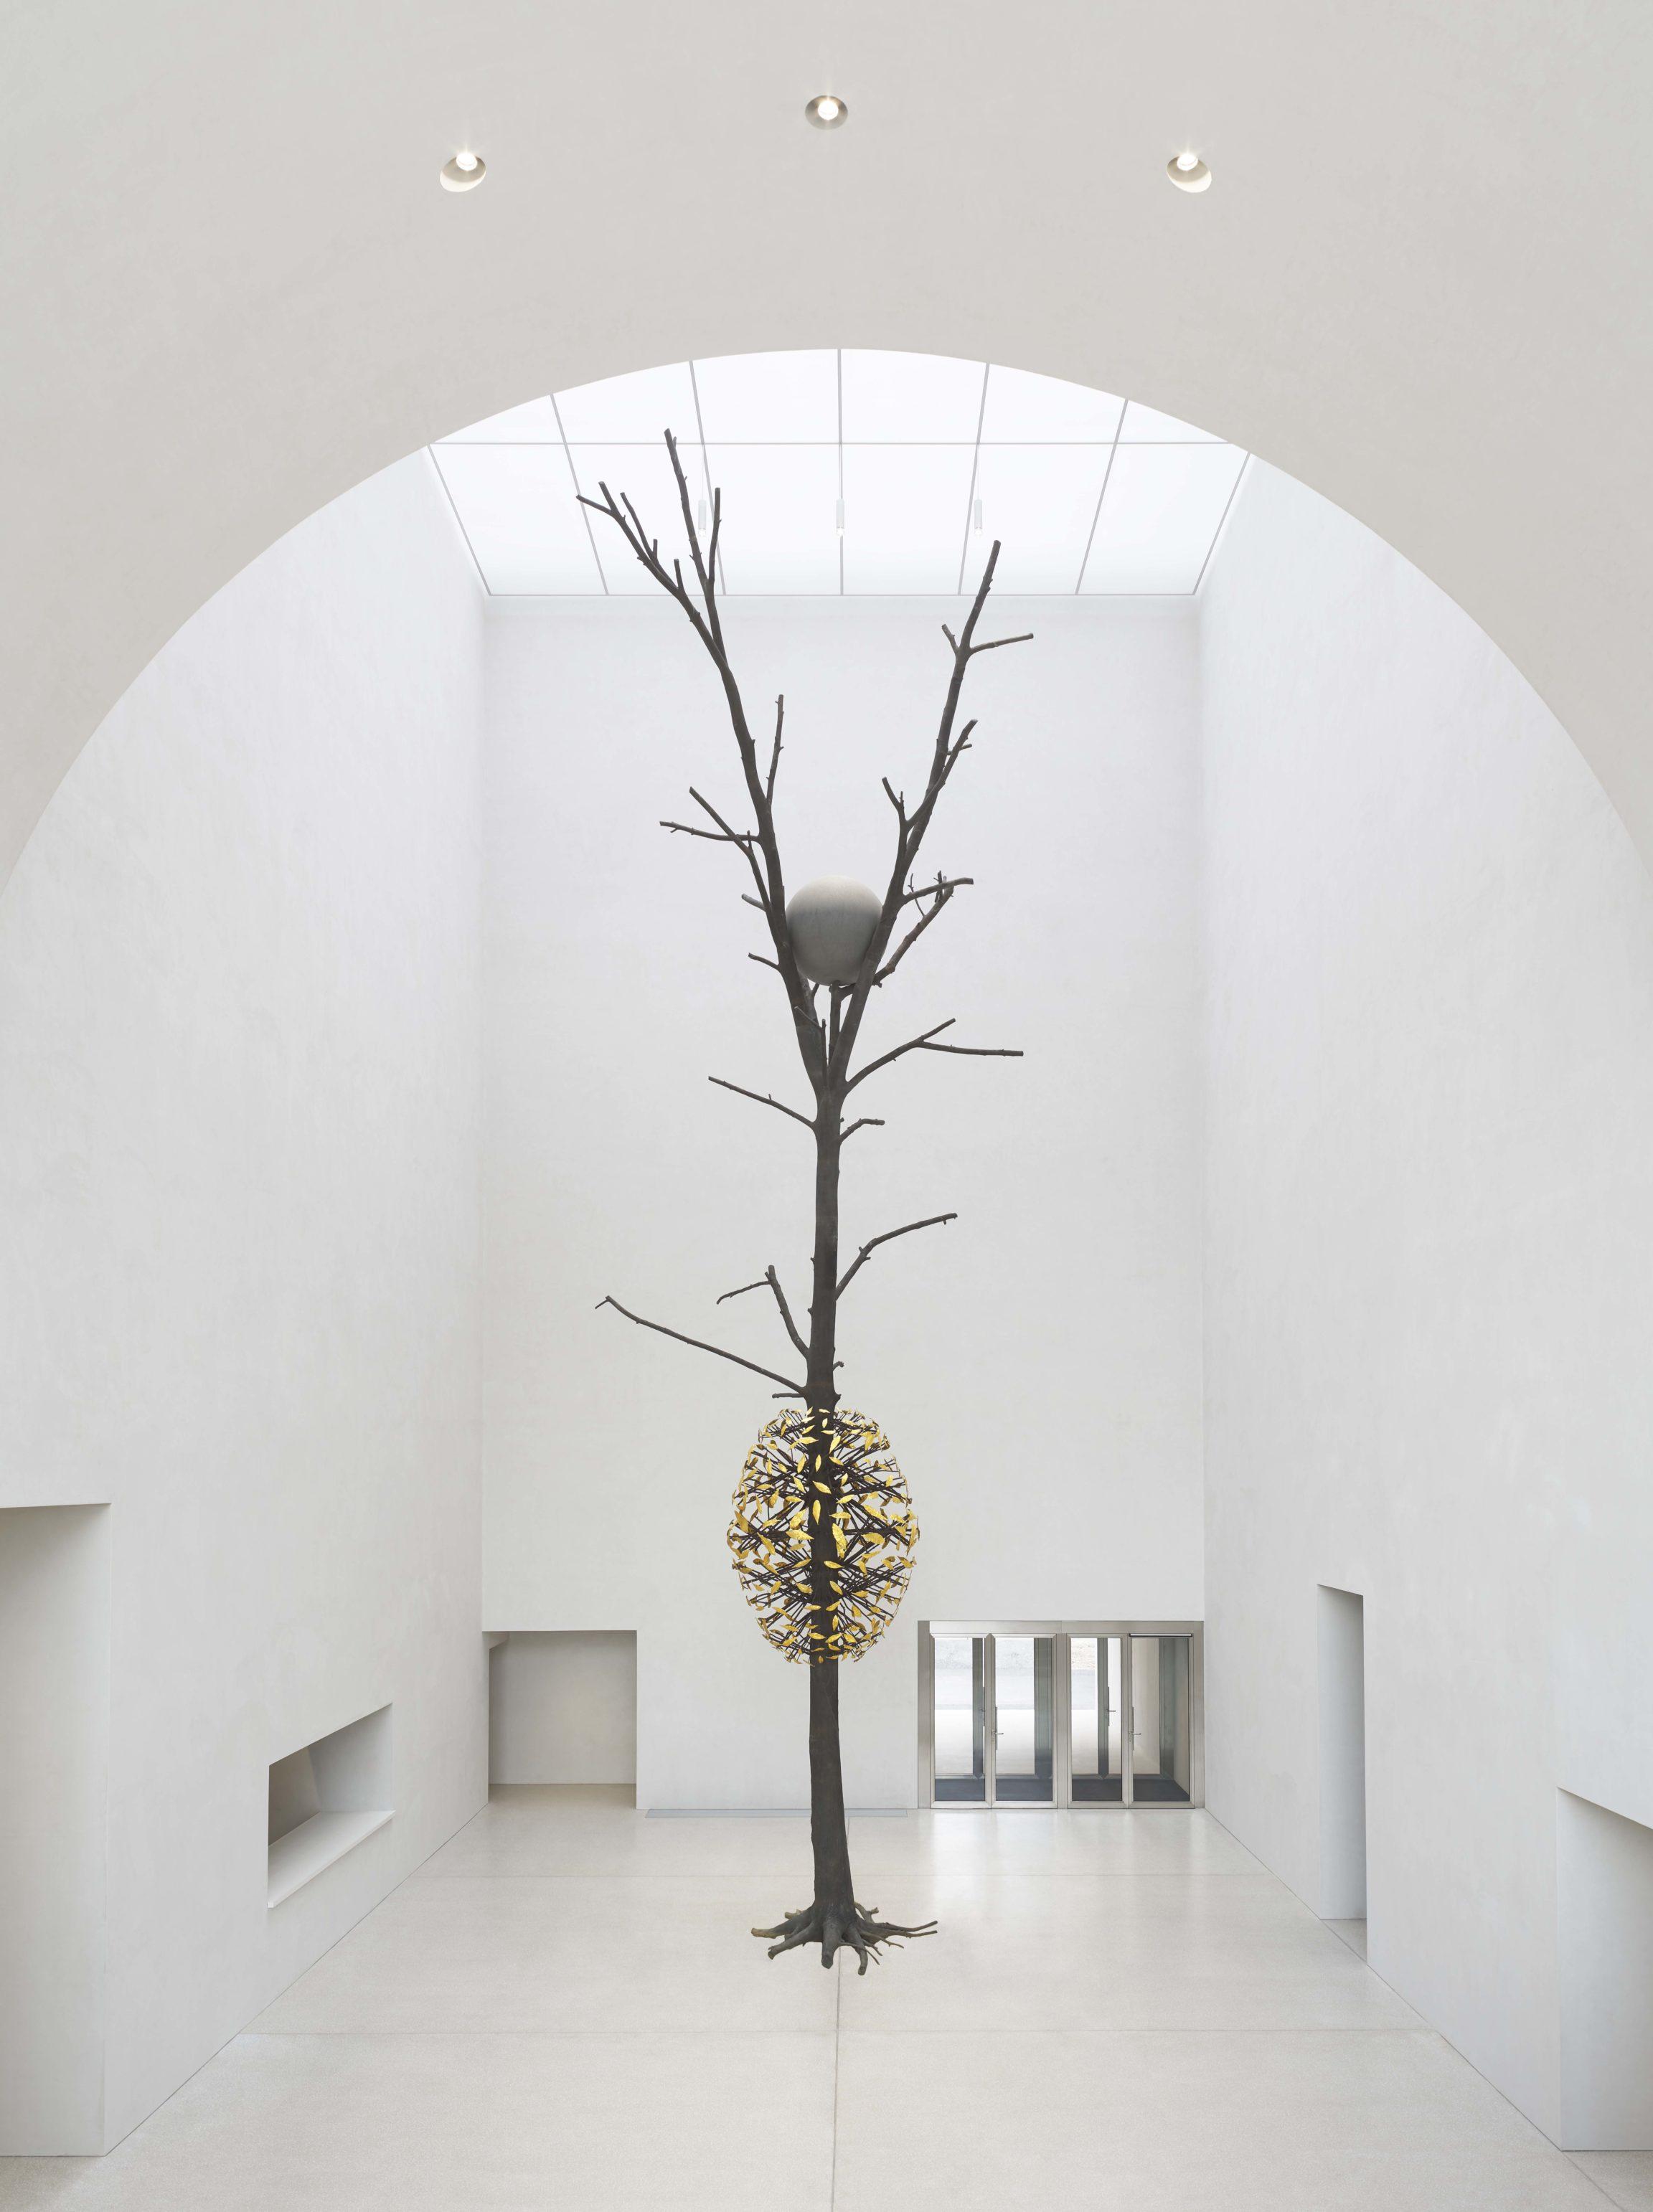 Giuseppe Penone, Luce e ombra, 2011